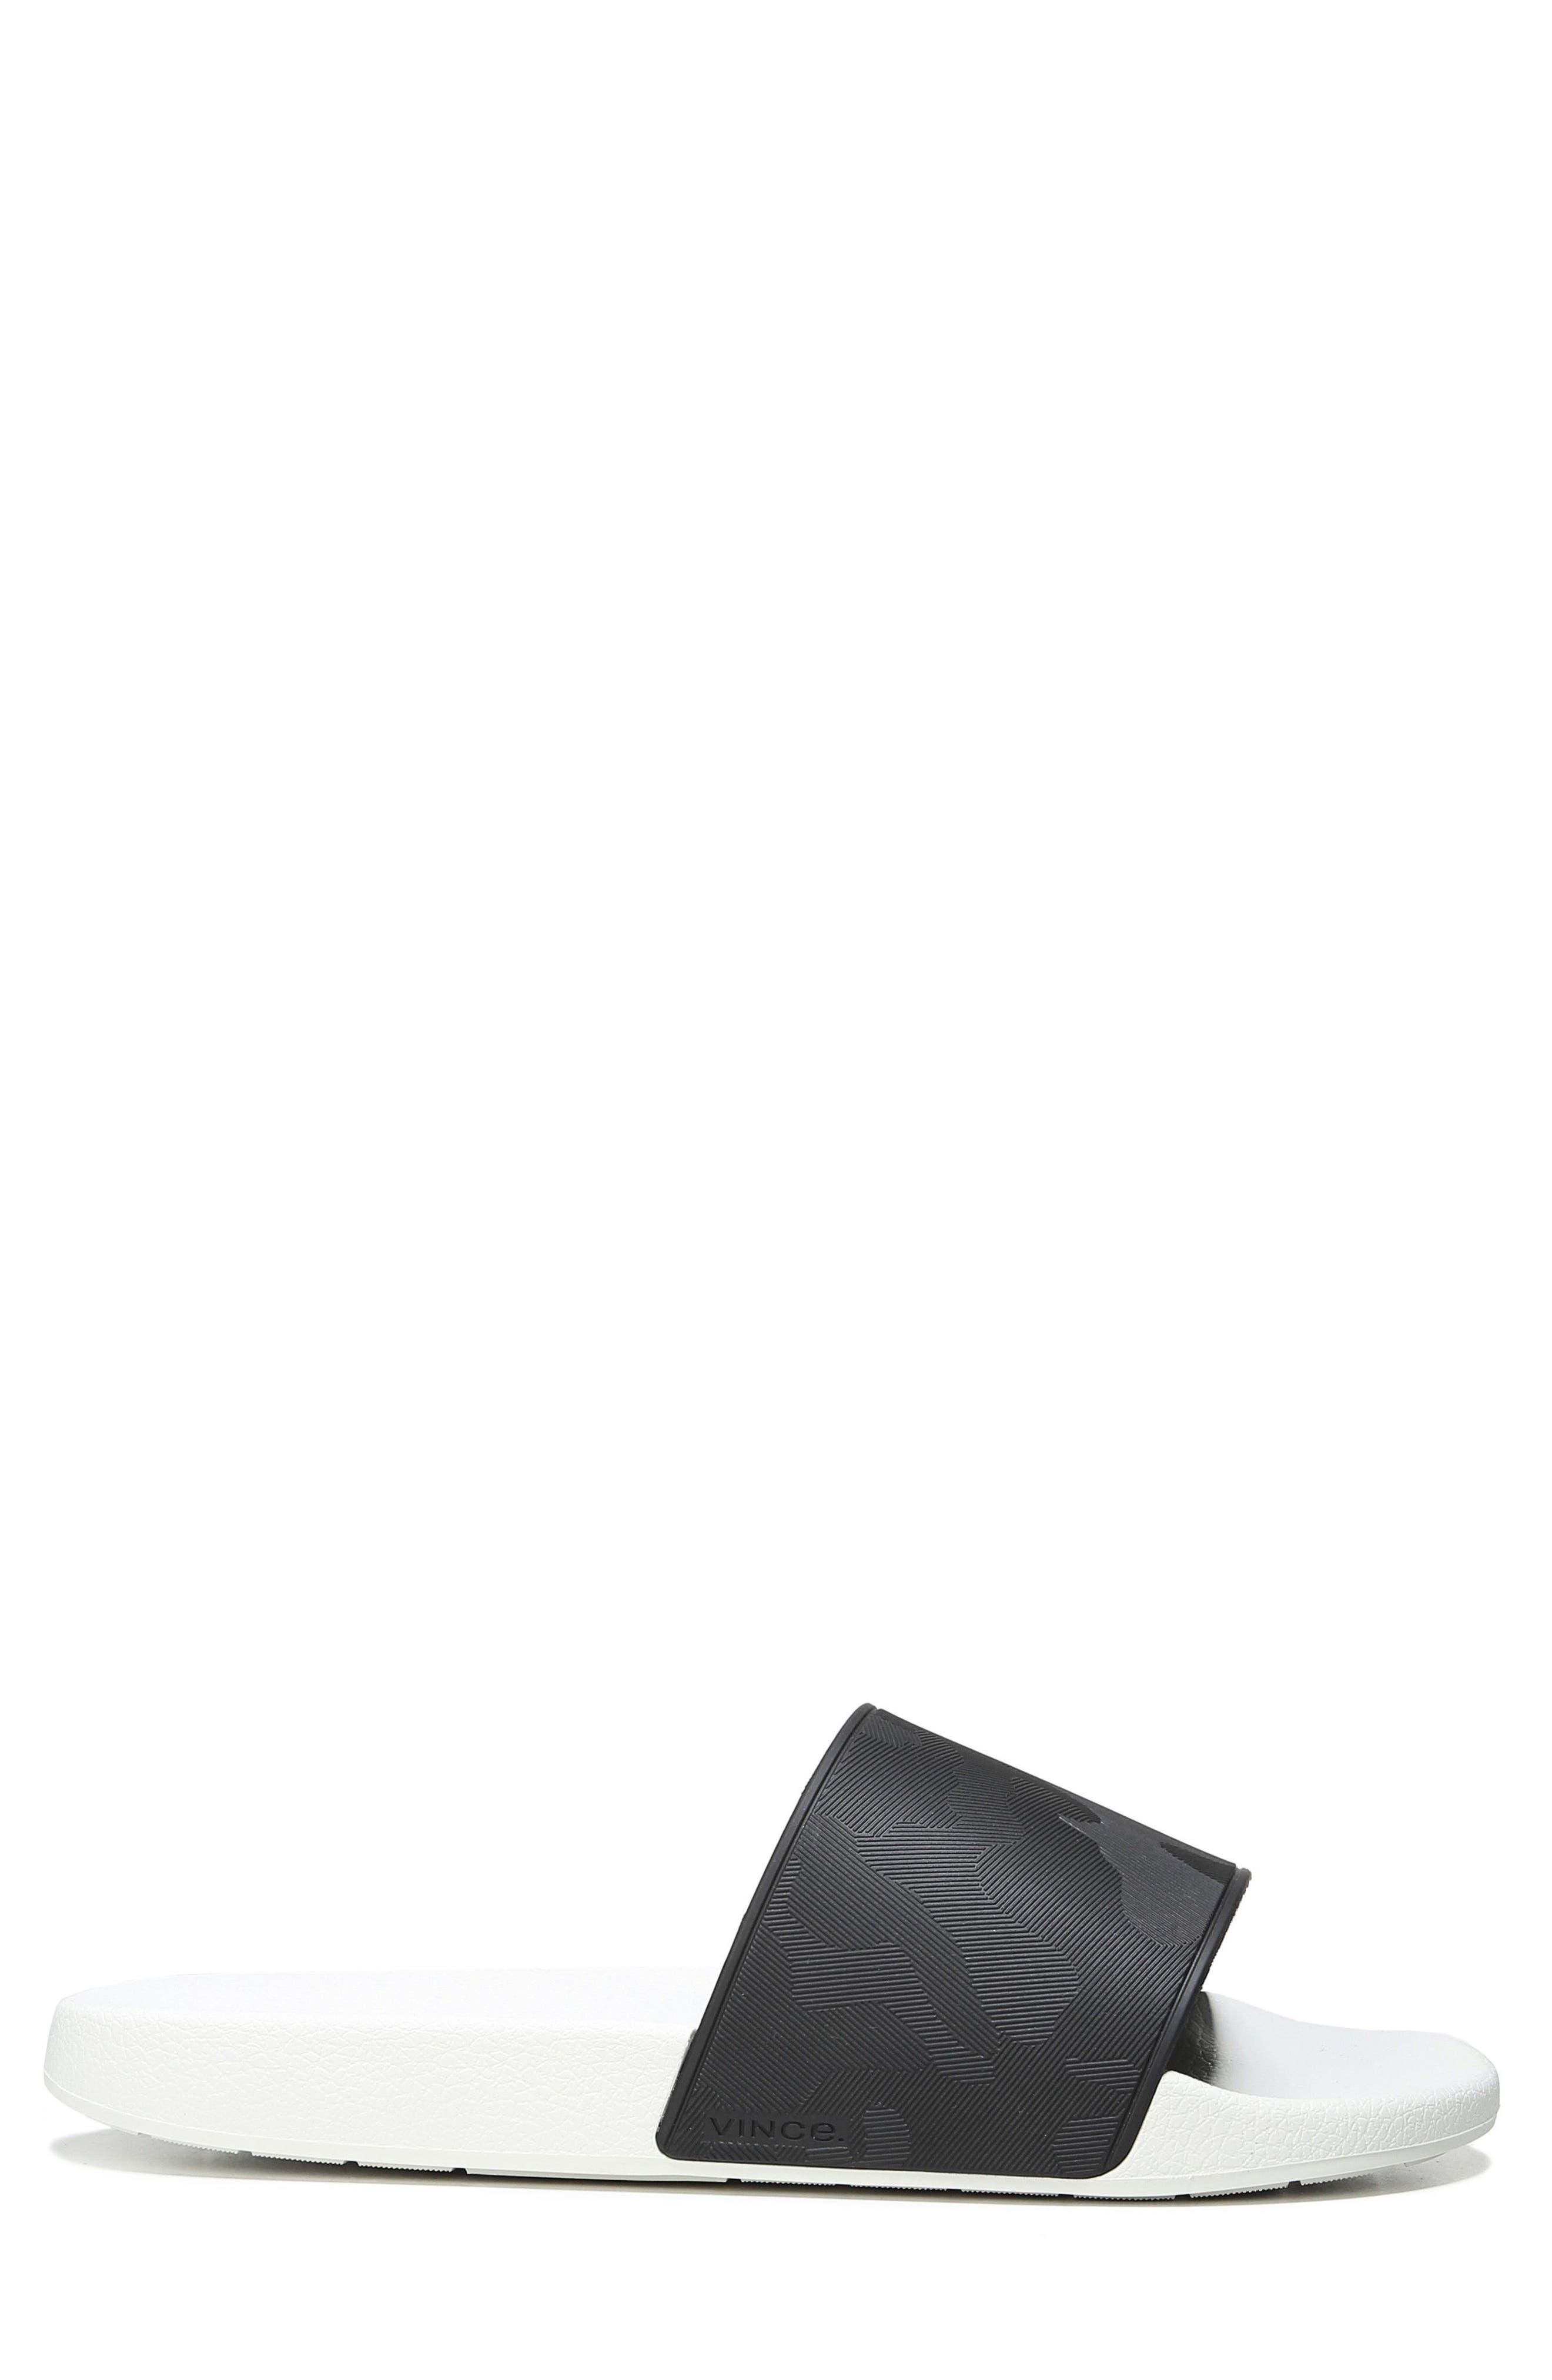 Westcoast-2 Slide Sandal,                             Alternate thumbnail 3, color,                             001